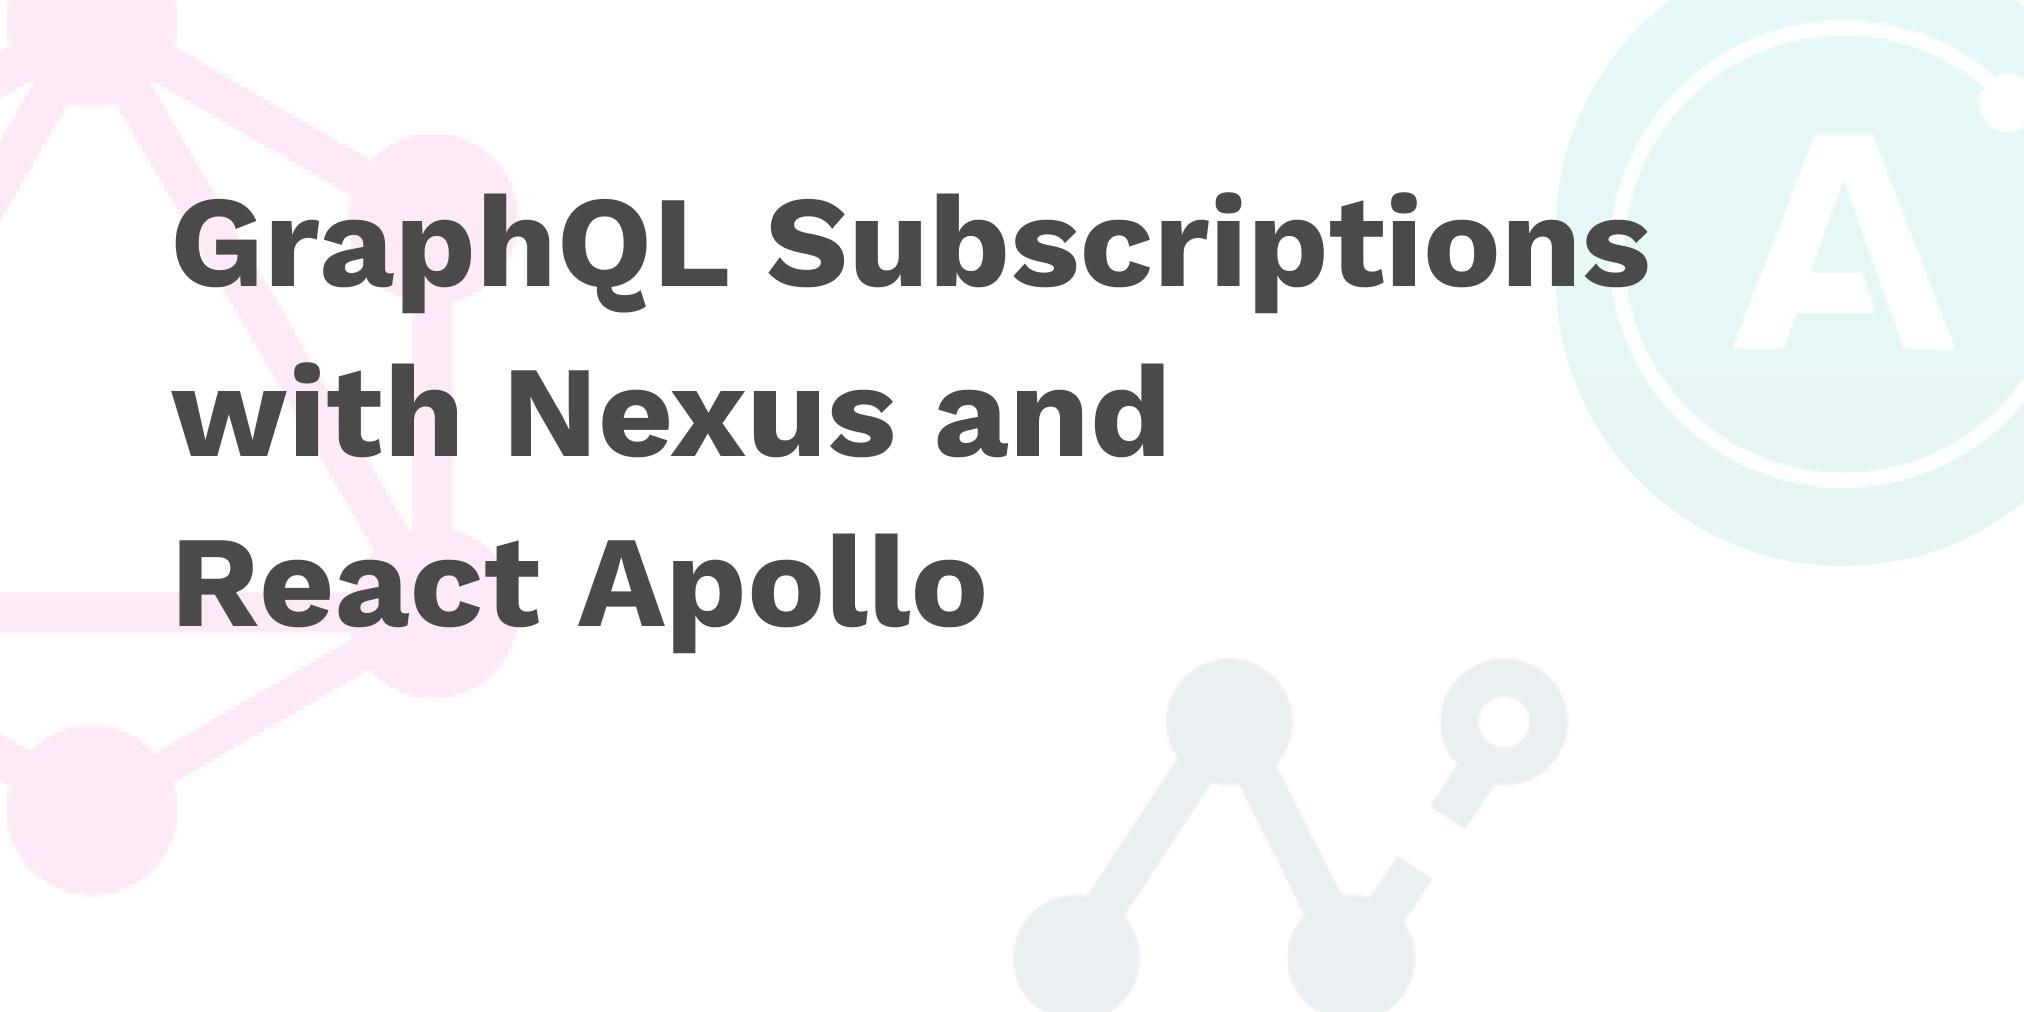 GraphQL Subscriptions with Nexus and React Apollo